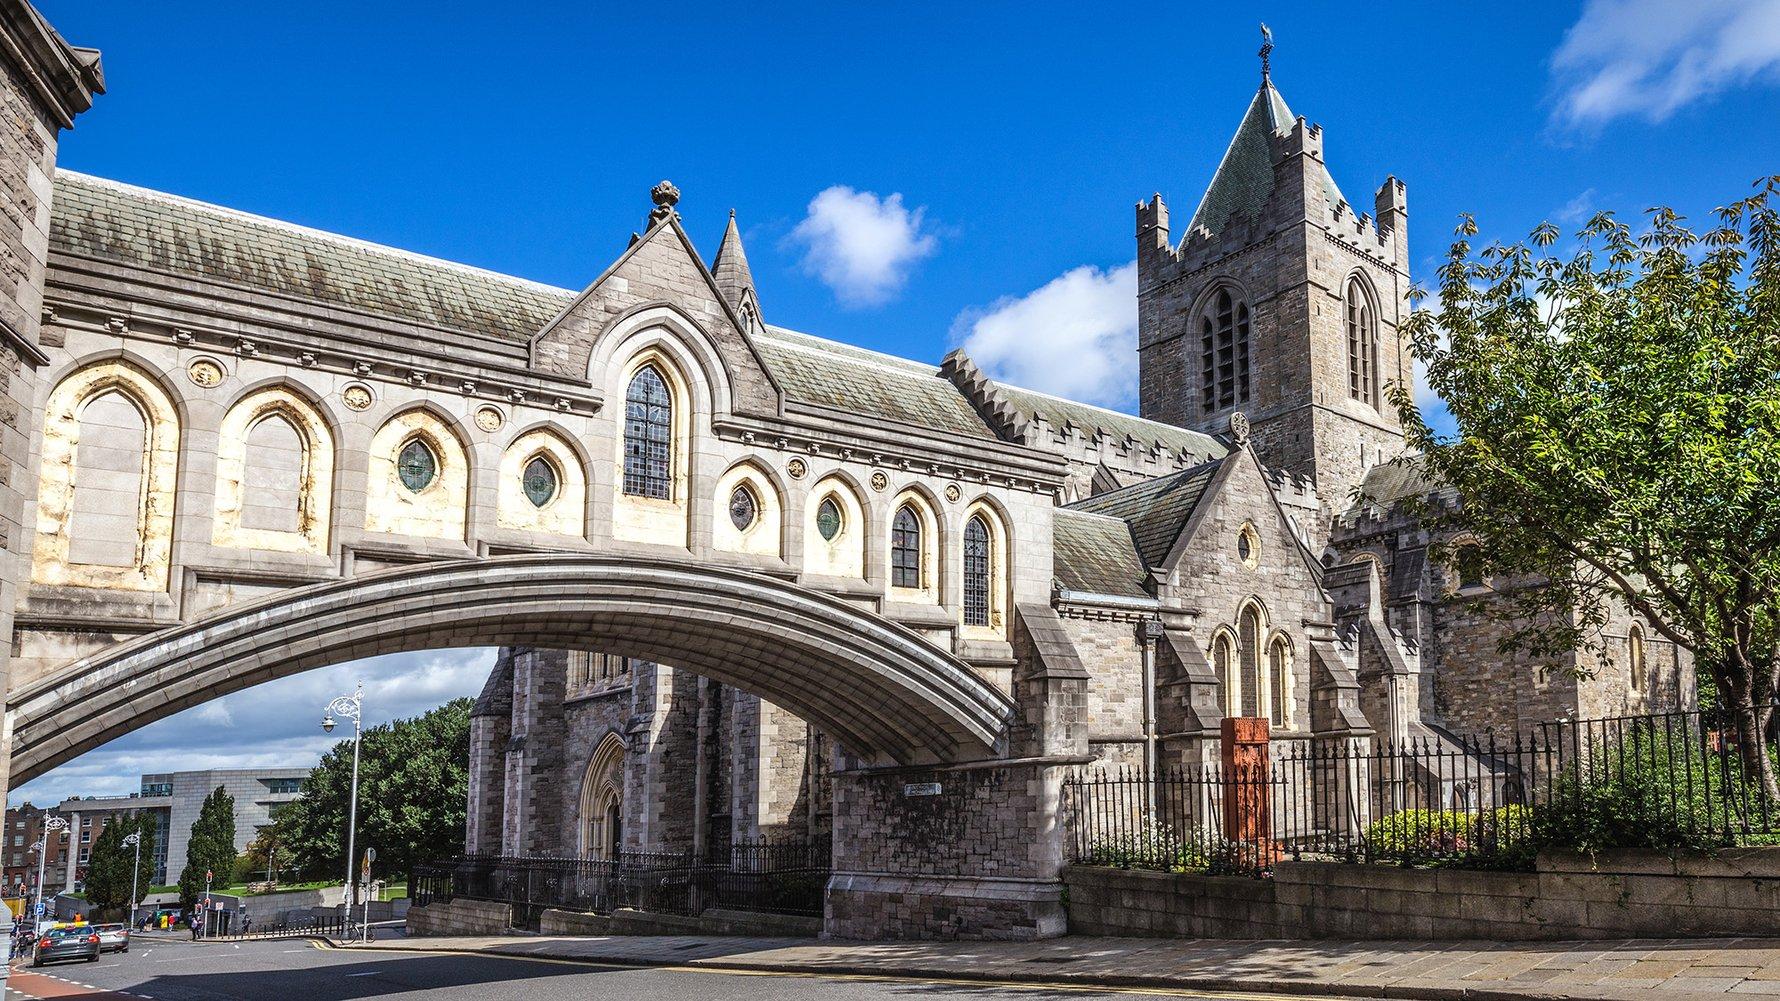 © C.Echeveste Shutterstock.com Christ Church Cathedral